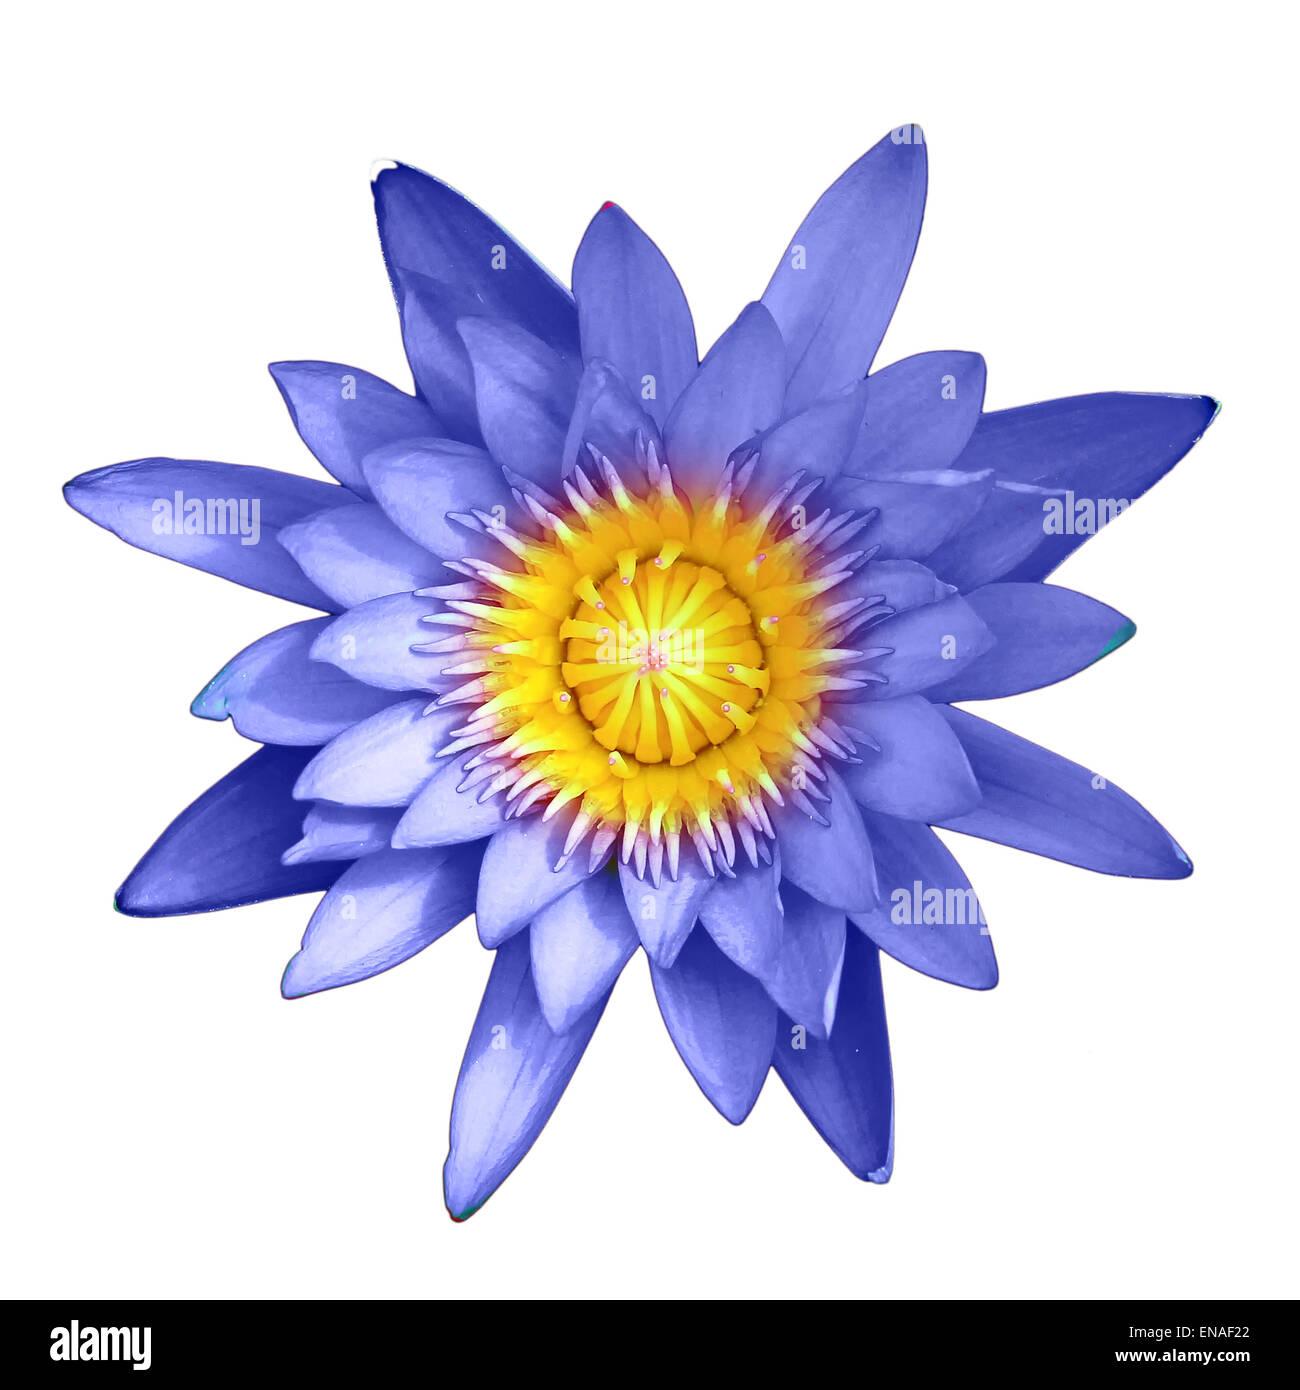 Blue Lotus Flower Isolated On White Background Stock Photo 81980586